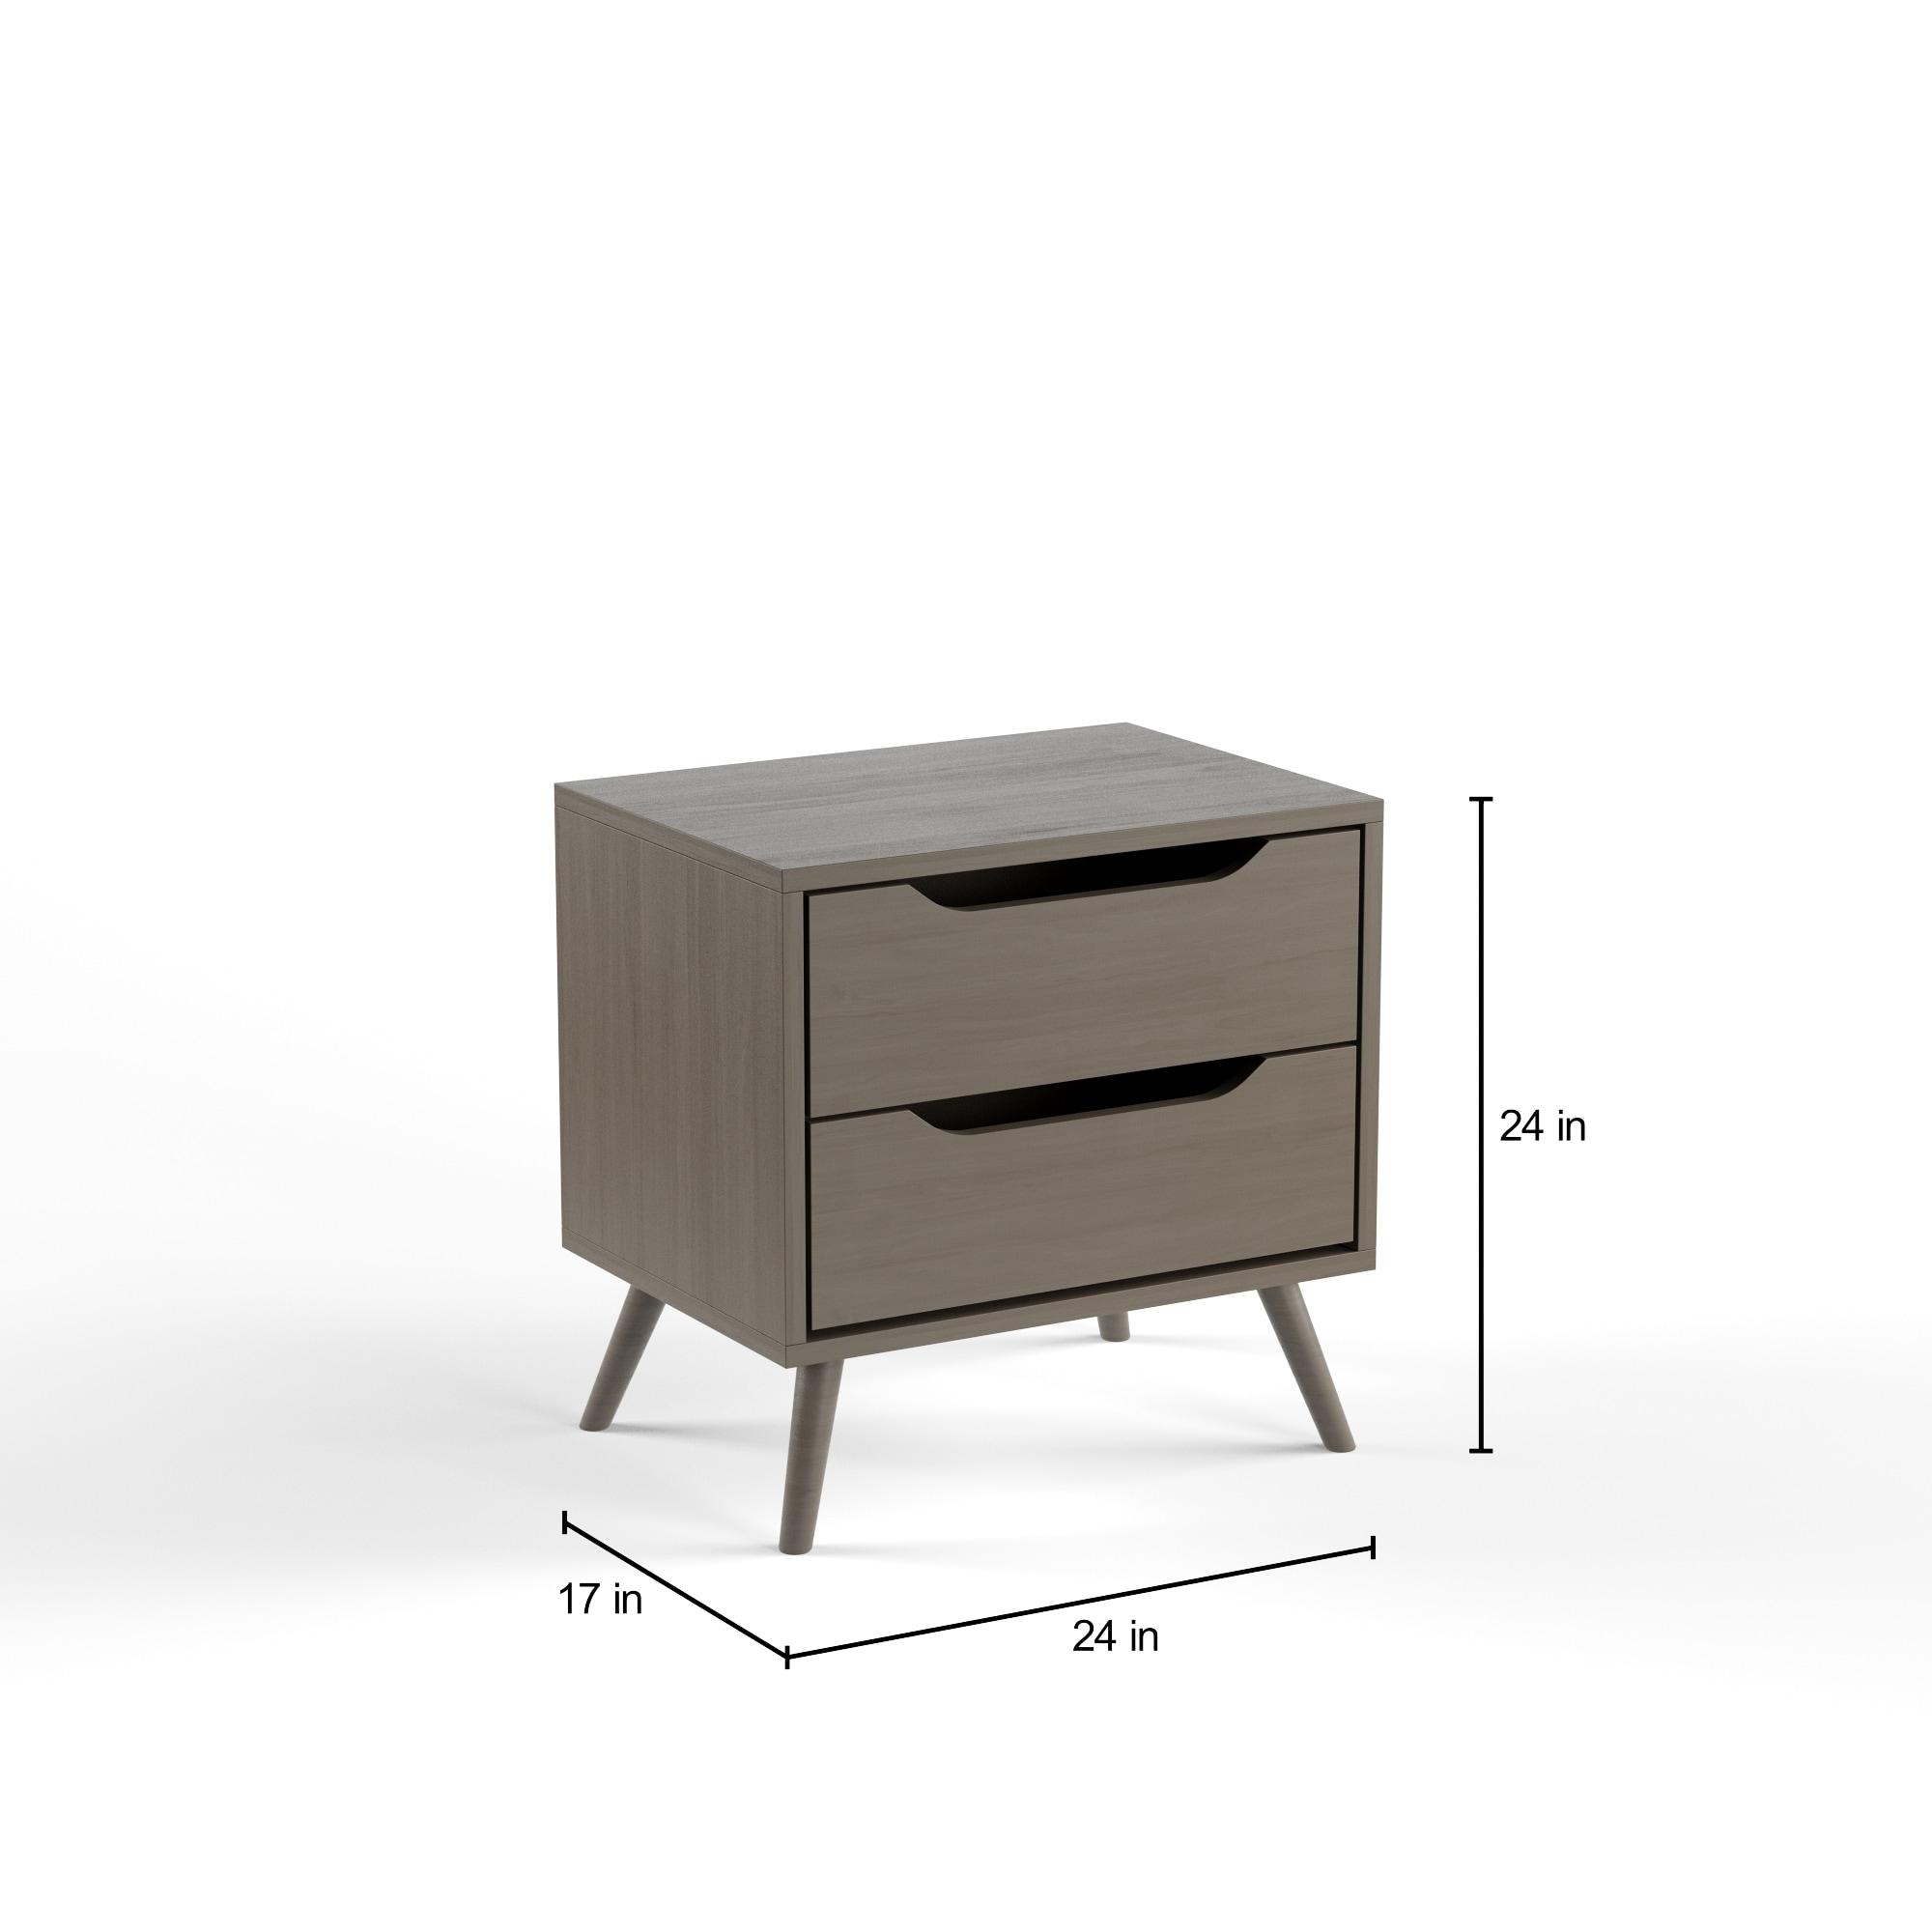 Furniture Of America Corrine Mid Century Modern 2 Drawer Nightstand   Free  Shipping Today   Overstock.com   19255569